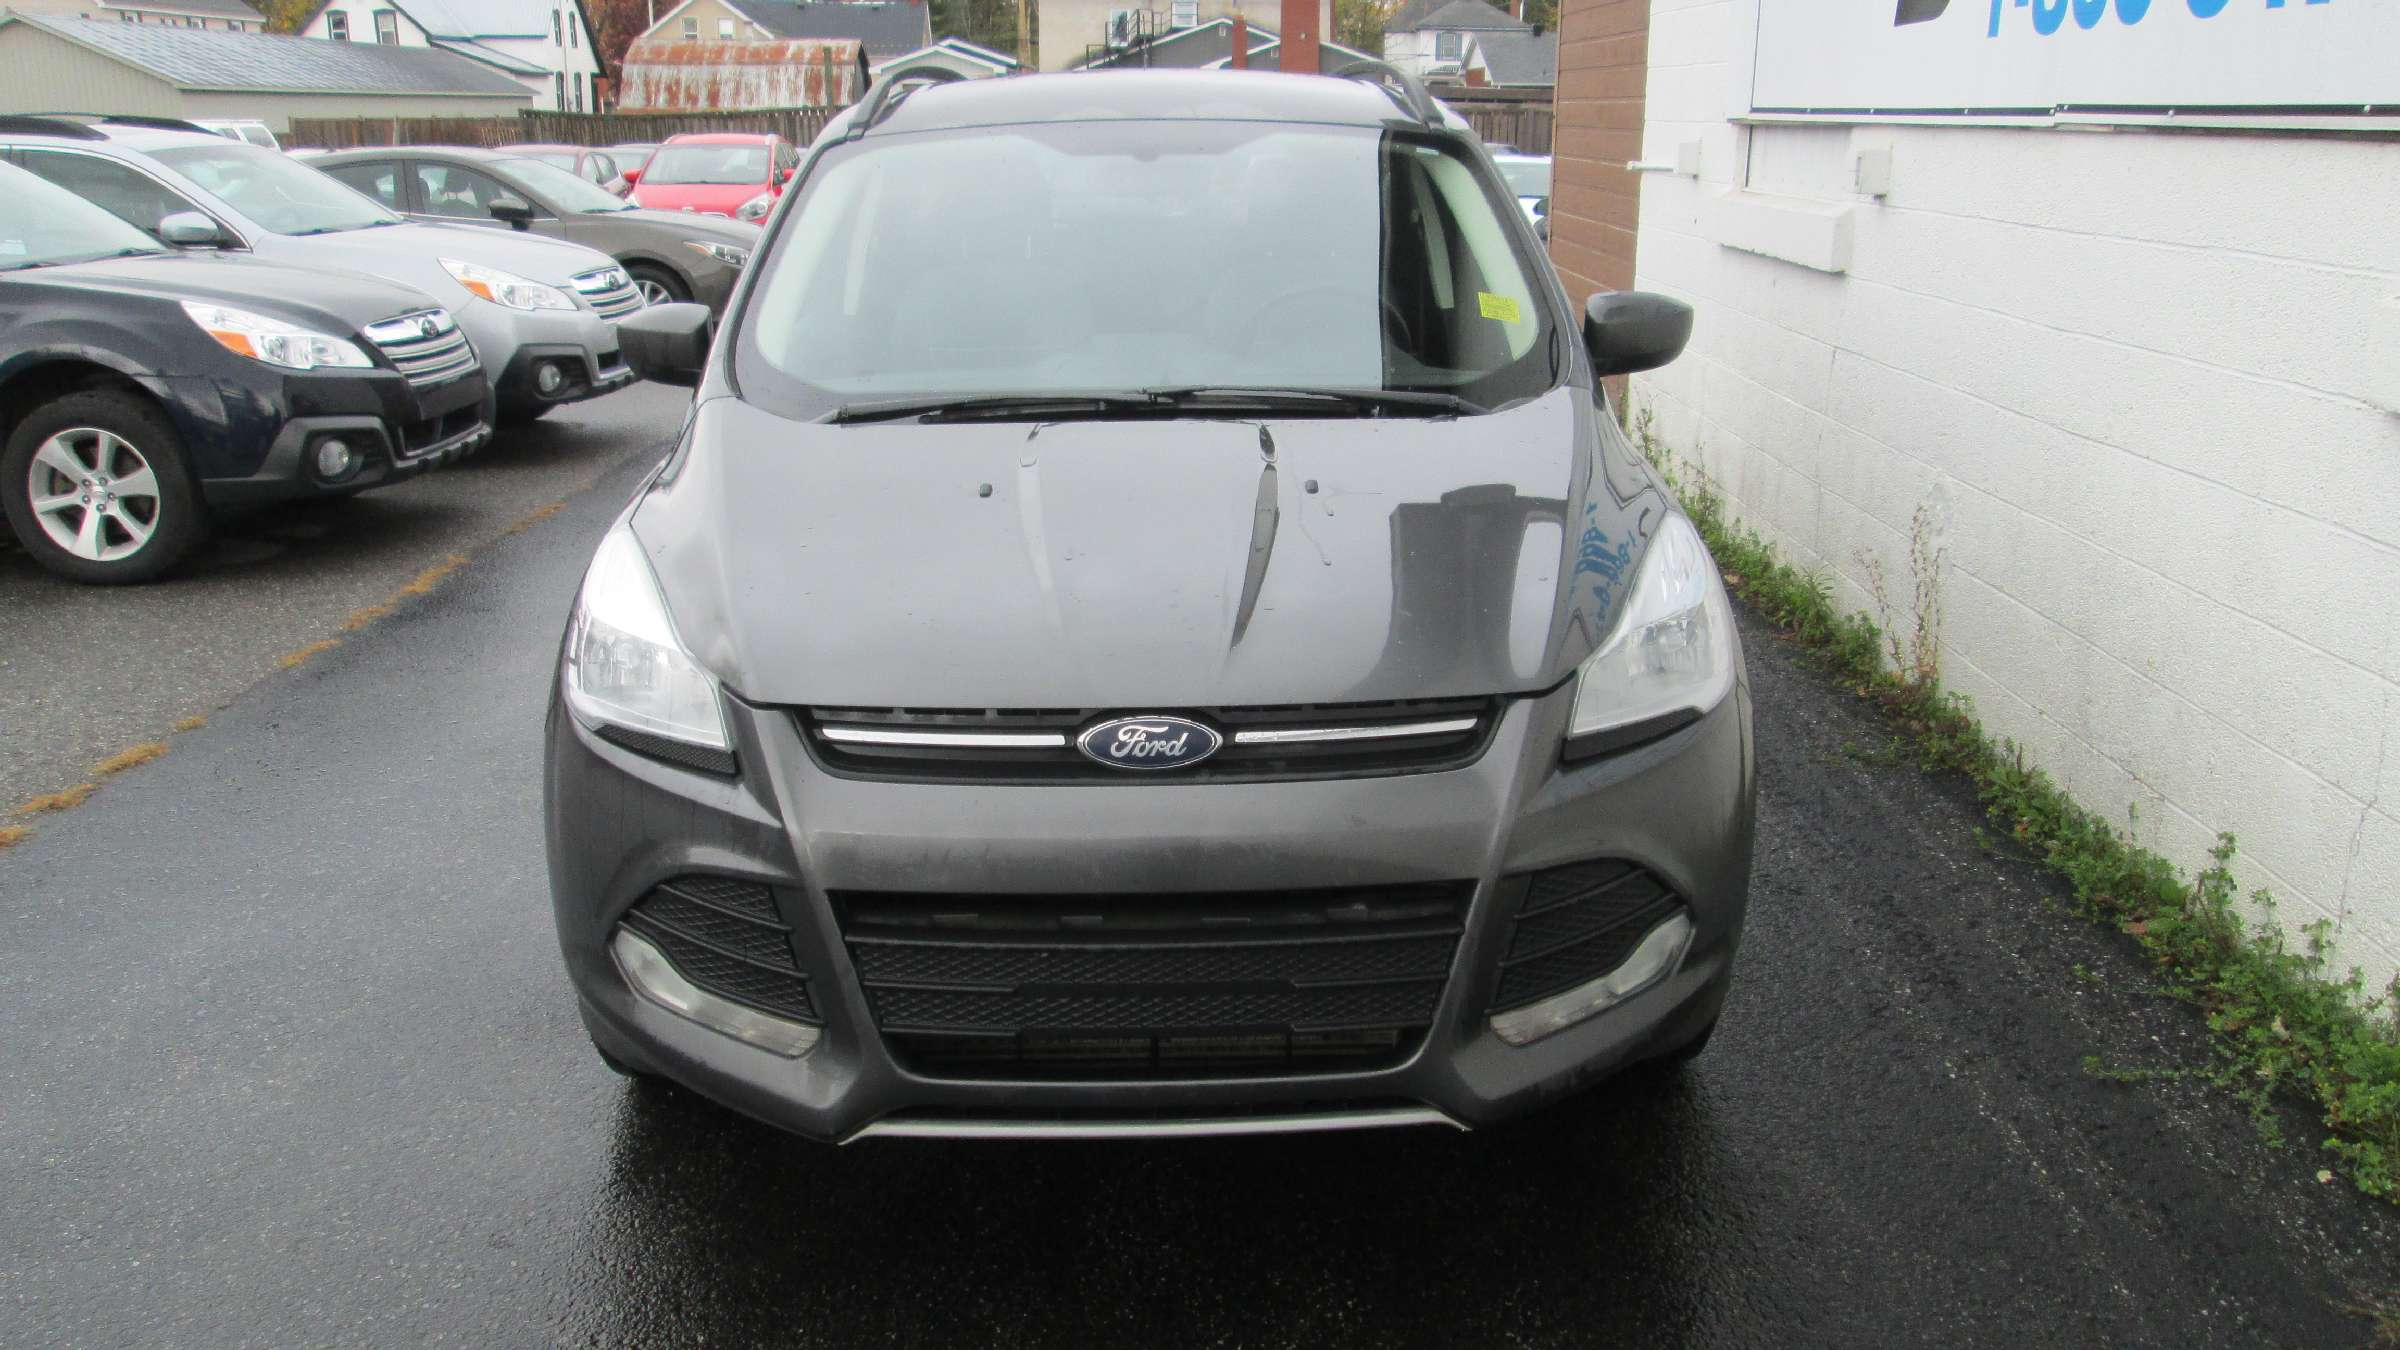 2015 Ford Escape SE (Stk: 171498) in Kingston - Image 1 of 12